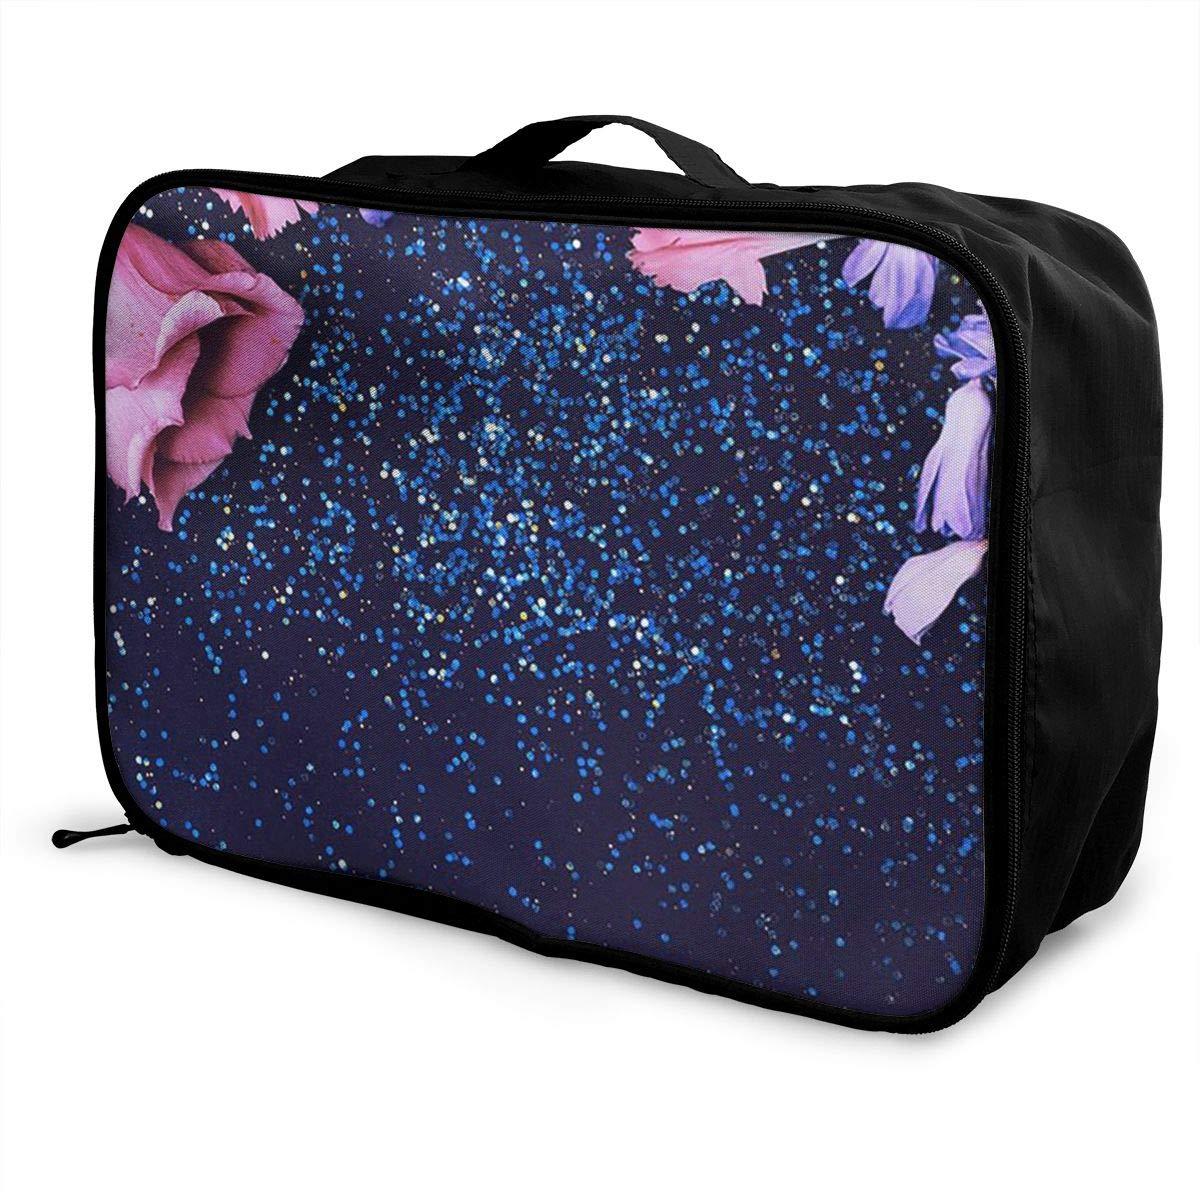 Travel Luggage Duffle Bag Lightweight Portable Handbag Pink Flower Pattern Large Capacity Waterproof Foldable Storage Tote